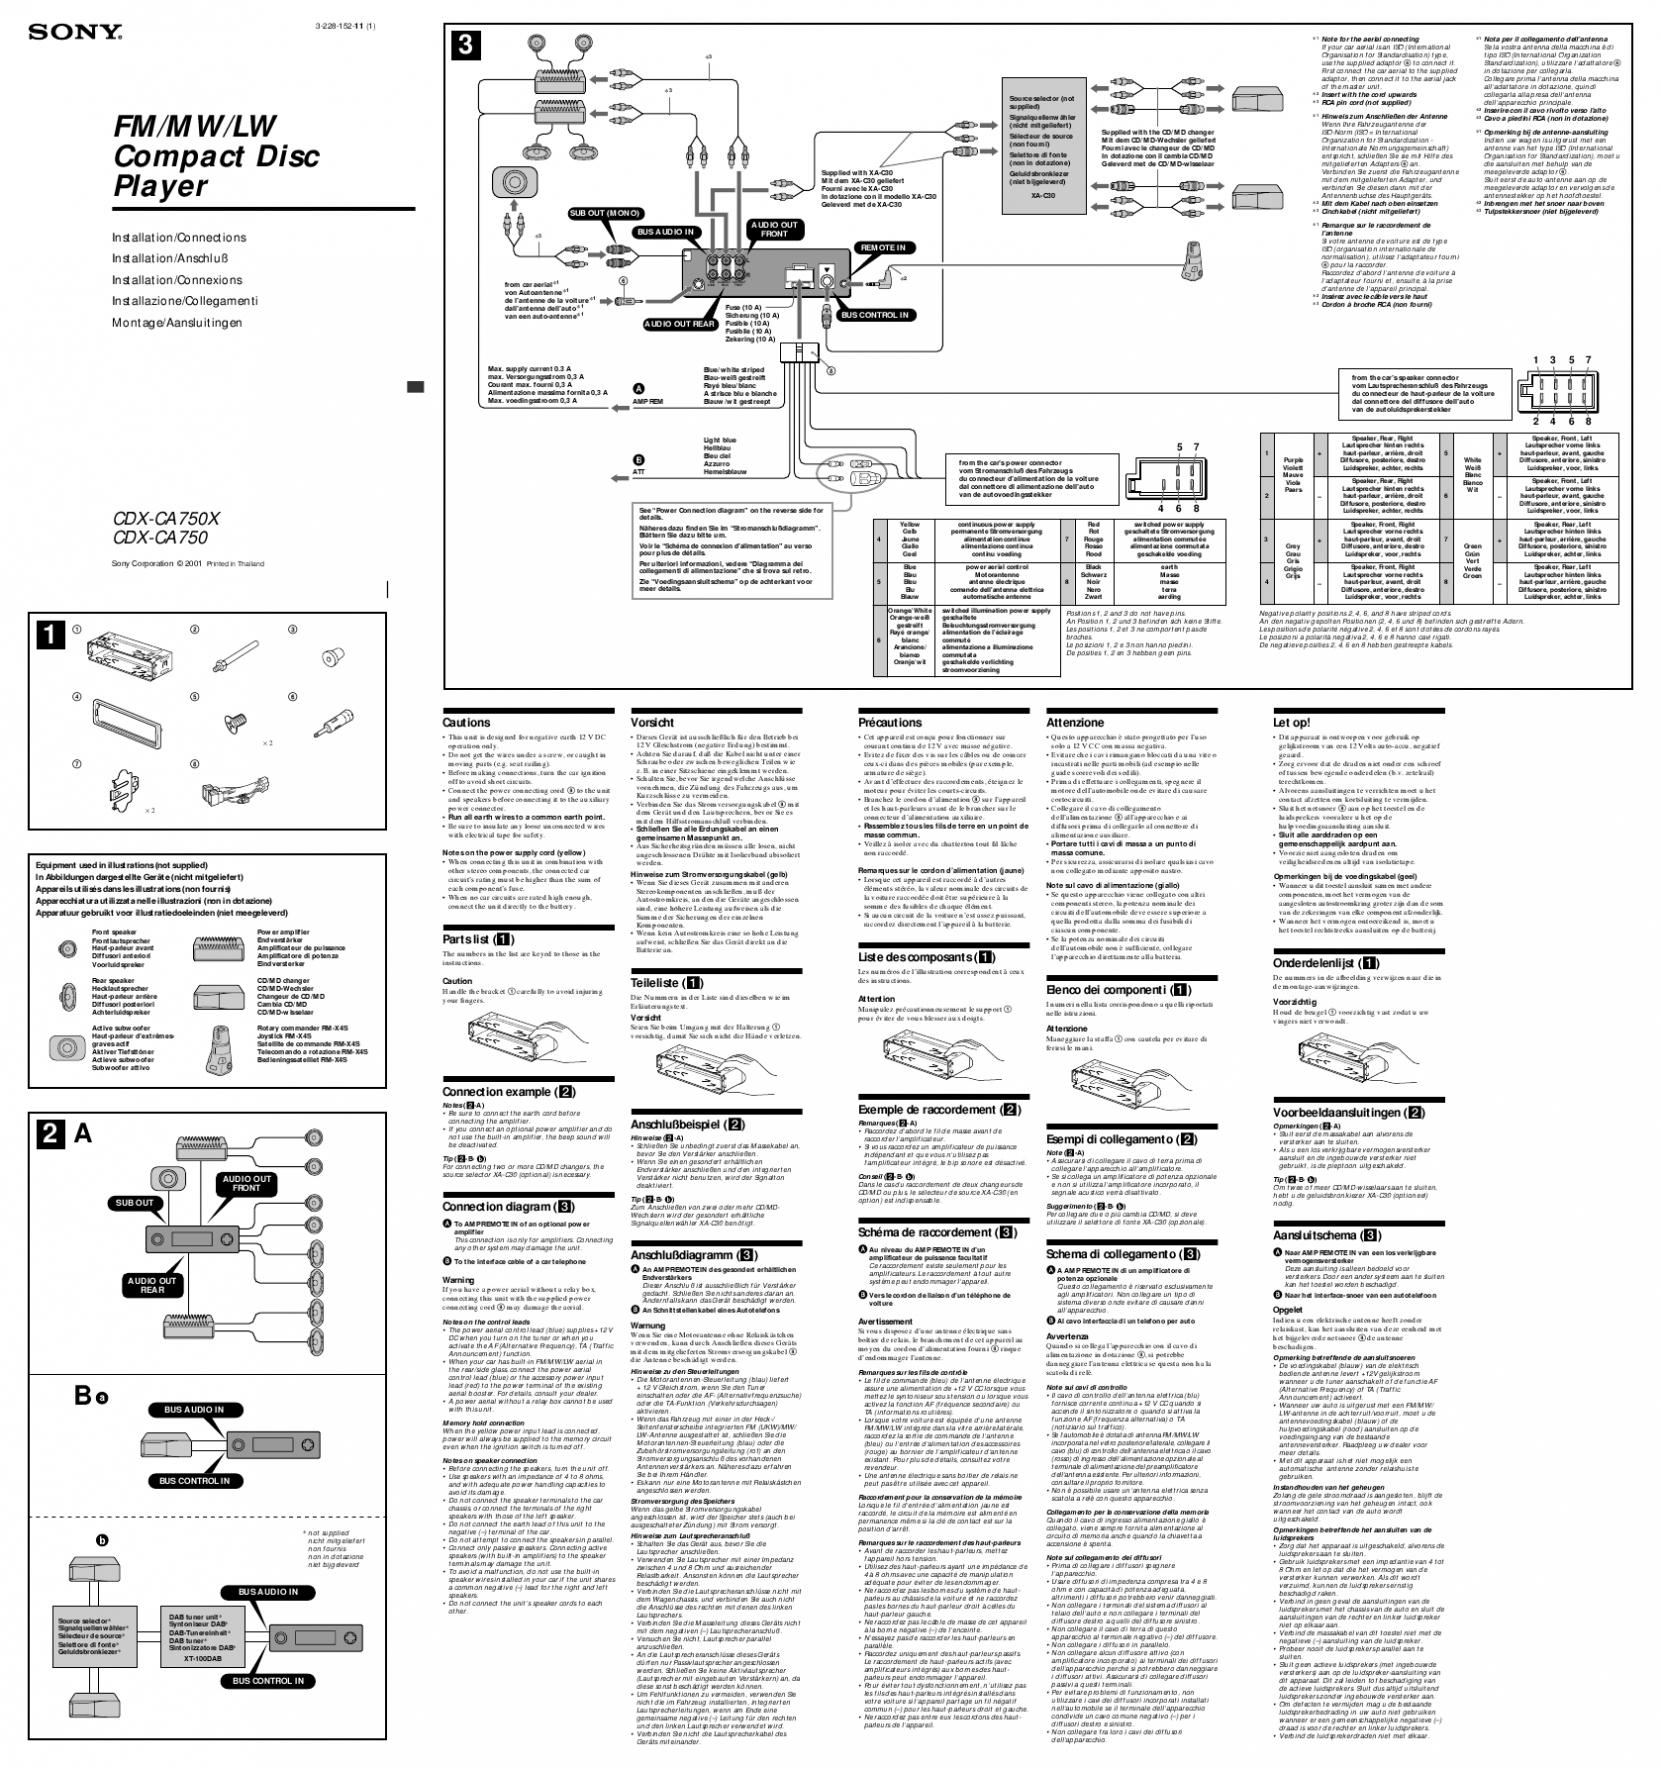 Pioneer Fh X720Bt Wiring Diagram – Pioneer Fh X700Bt Wiring Diagram - Pioneer Fh X720Bt Wiring Diagram